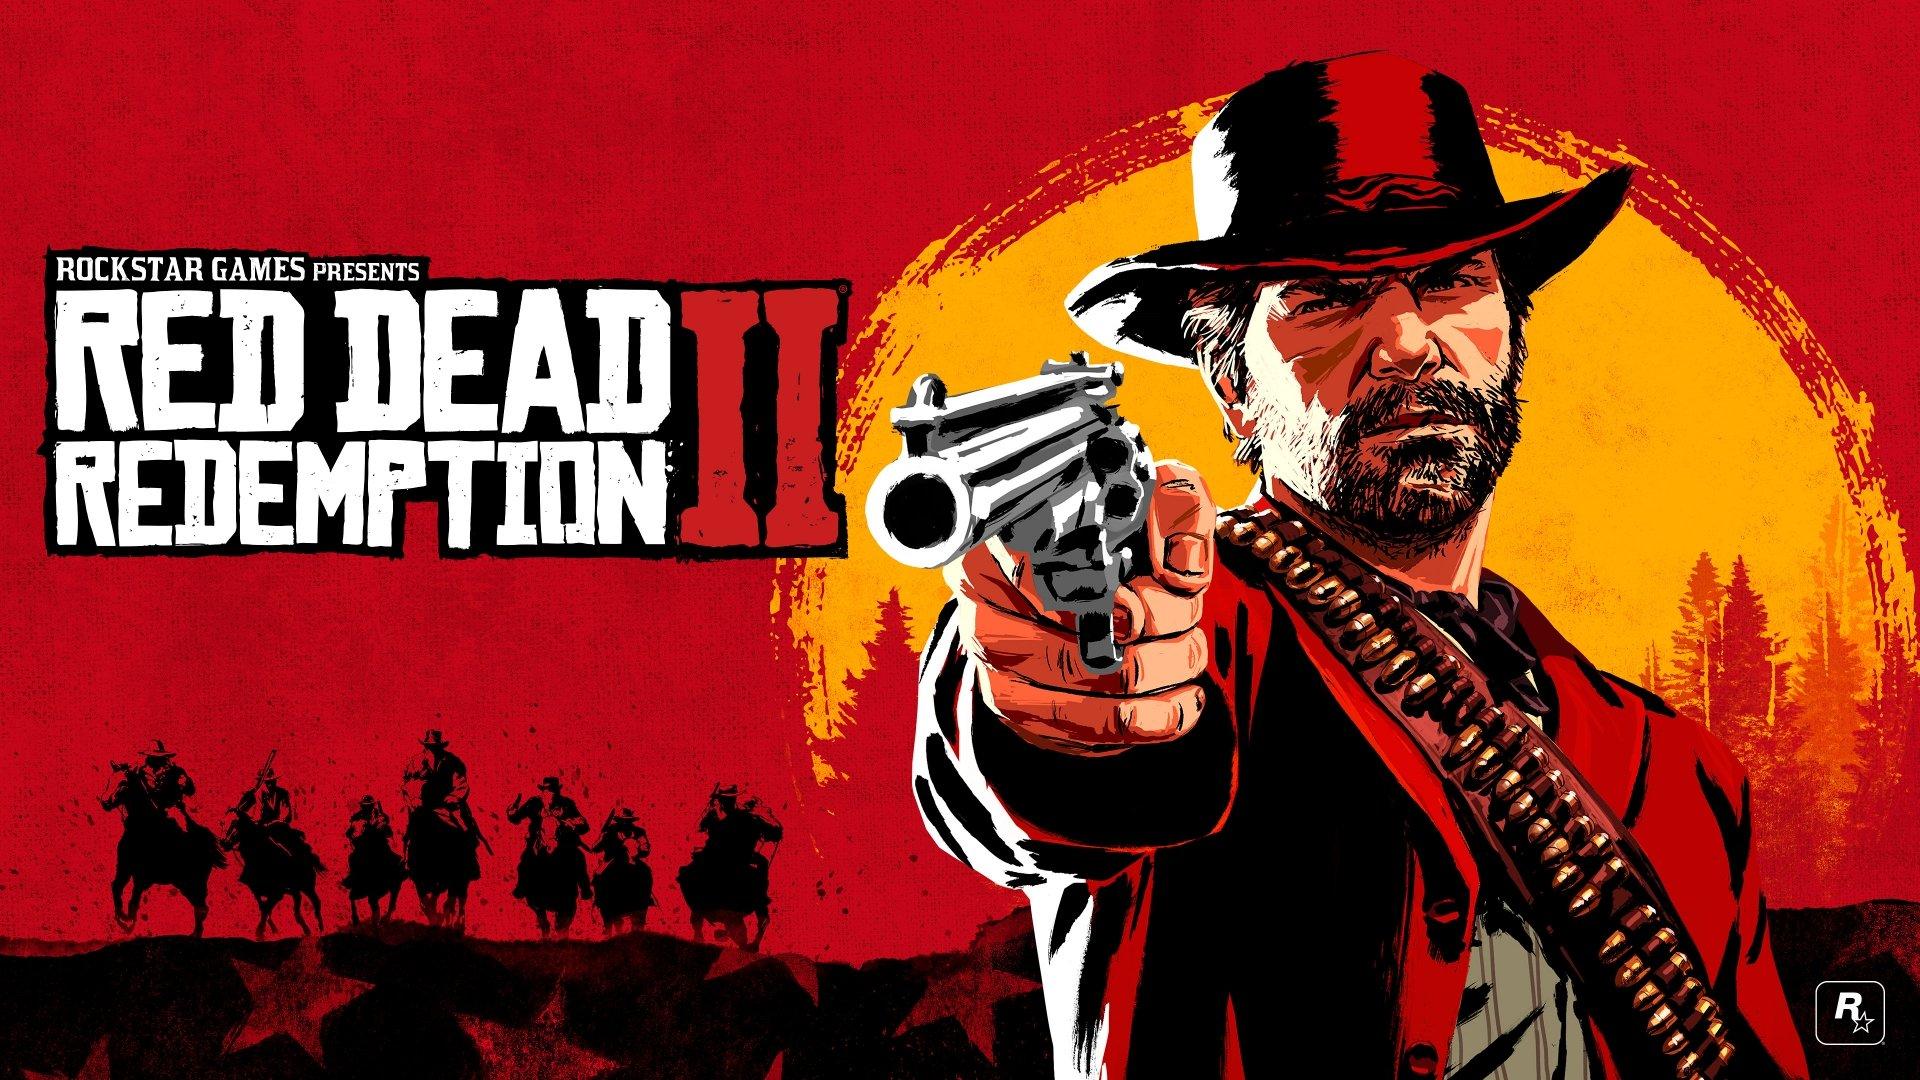 Red Dead Redemption 2 Portada Fondo De Pantalla 4k Ultra Hd